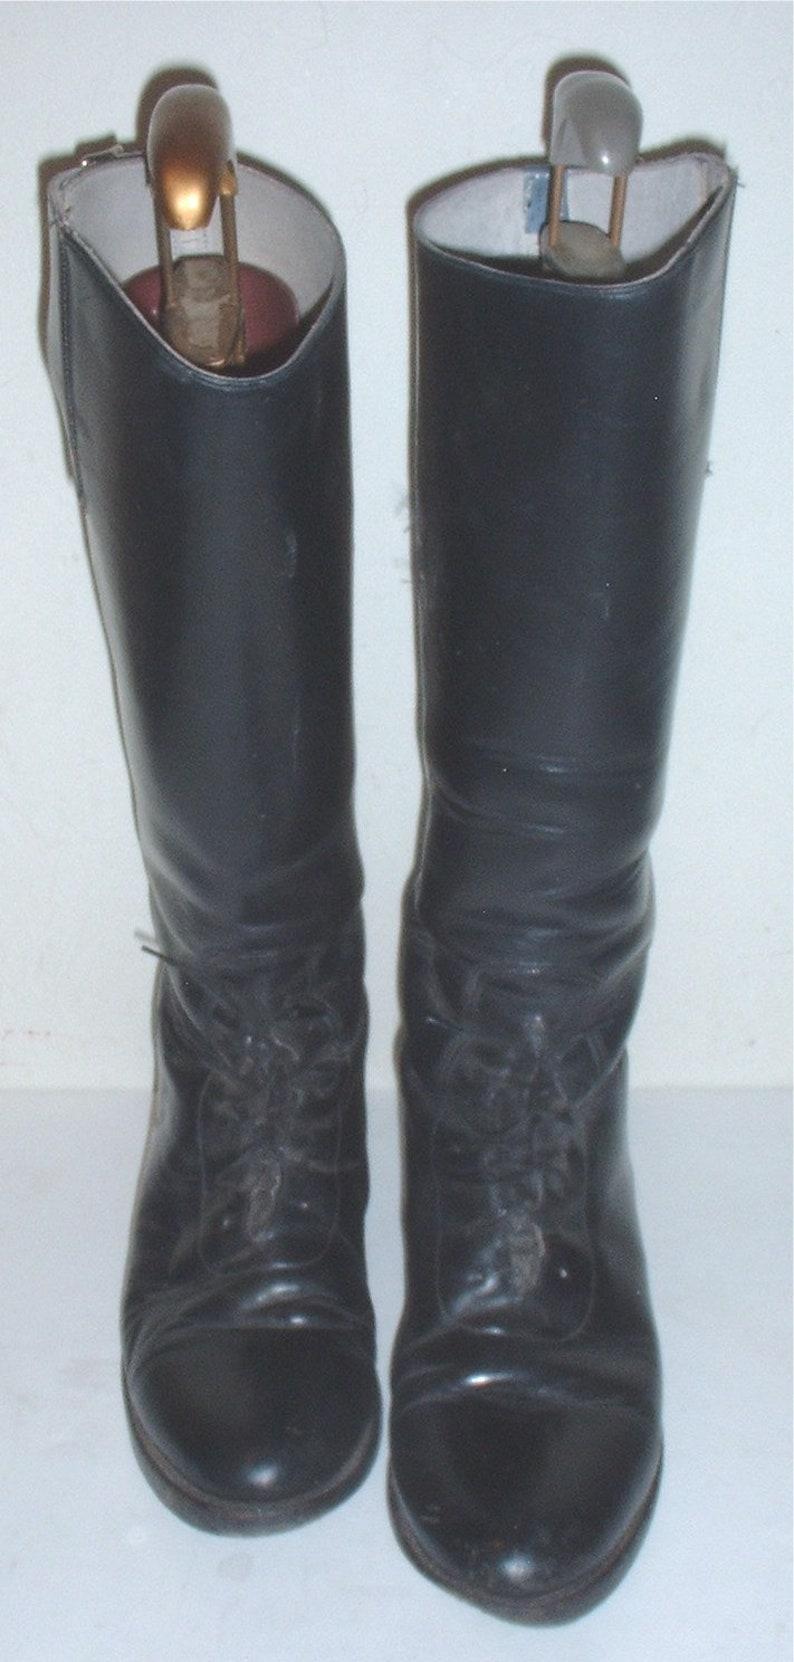 79554b18856fd English Riding Boots: Effingham/Bond size 7-1/2